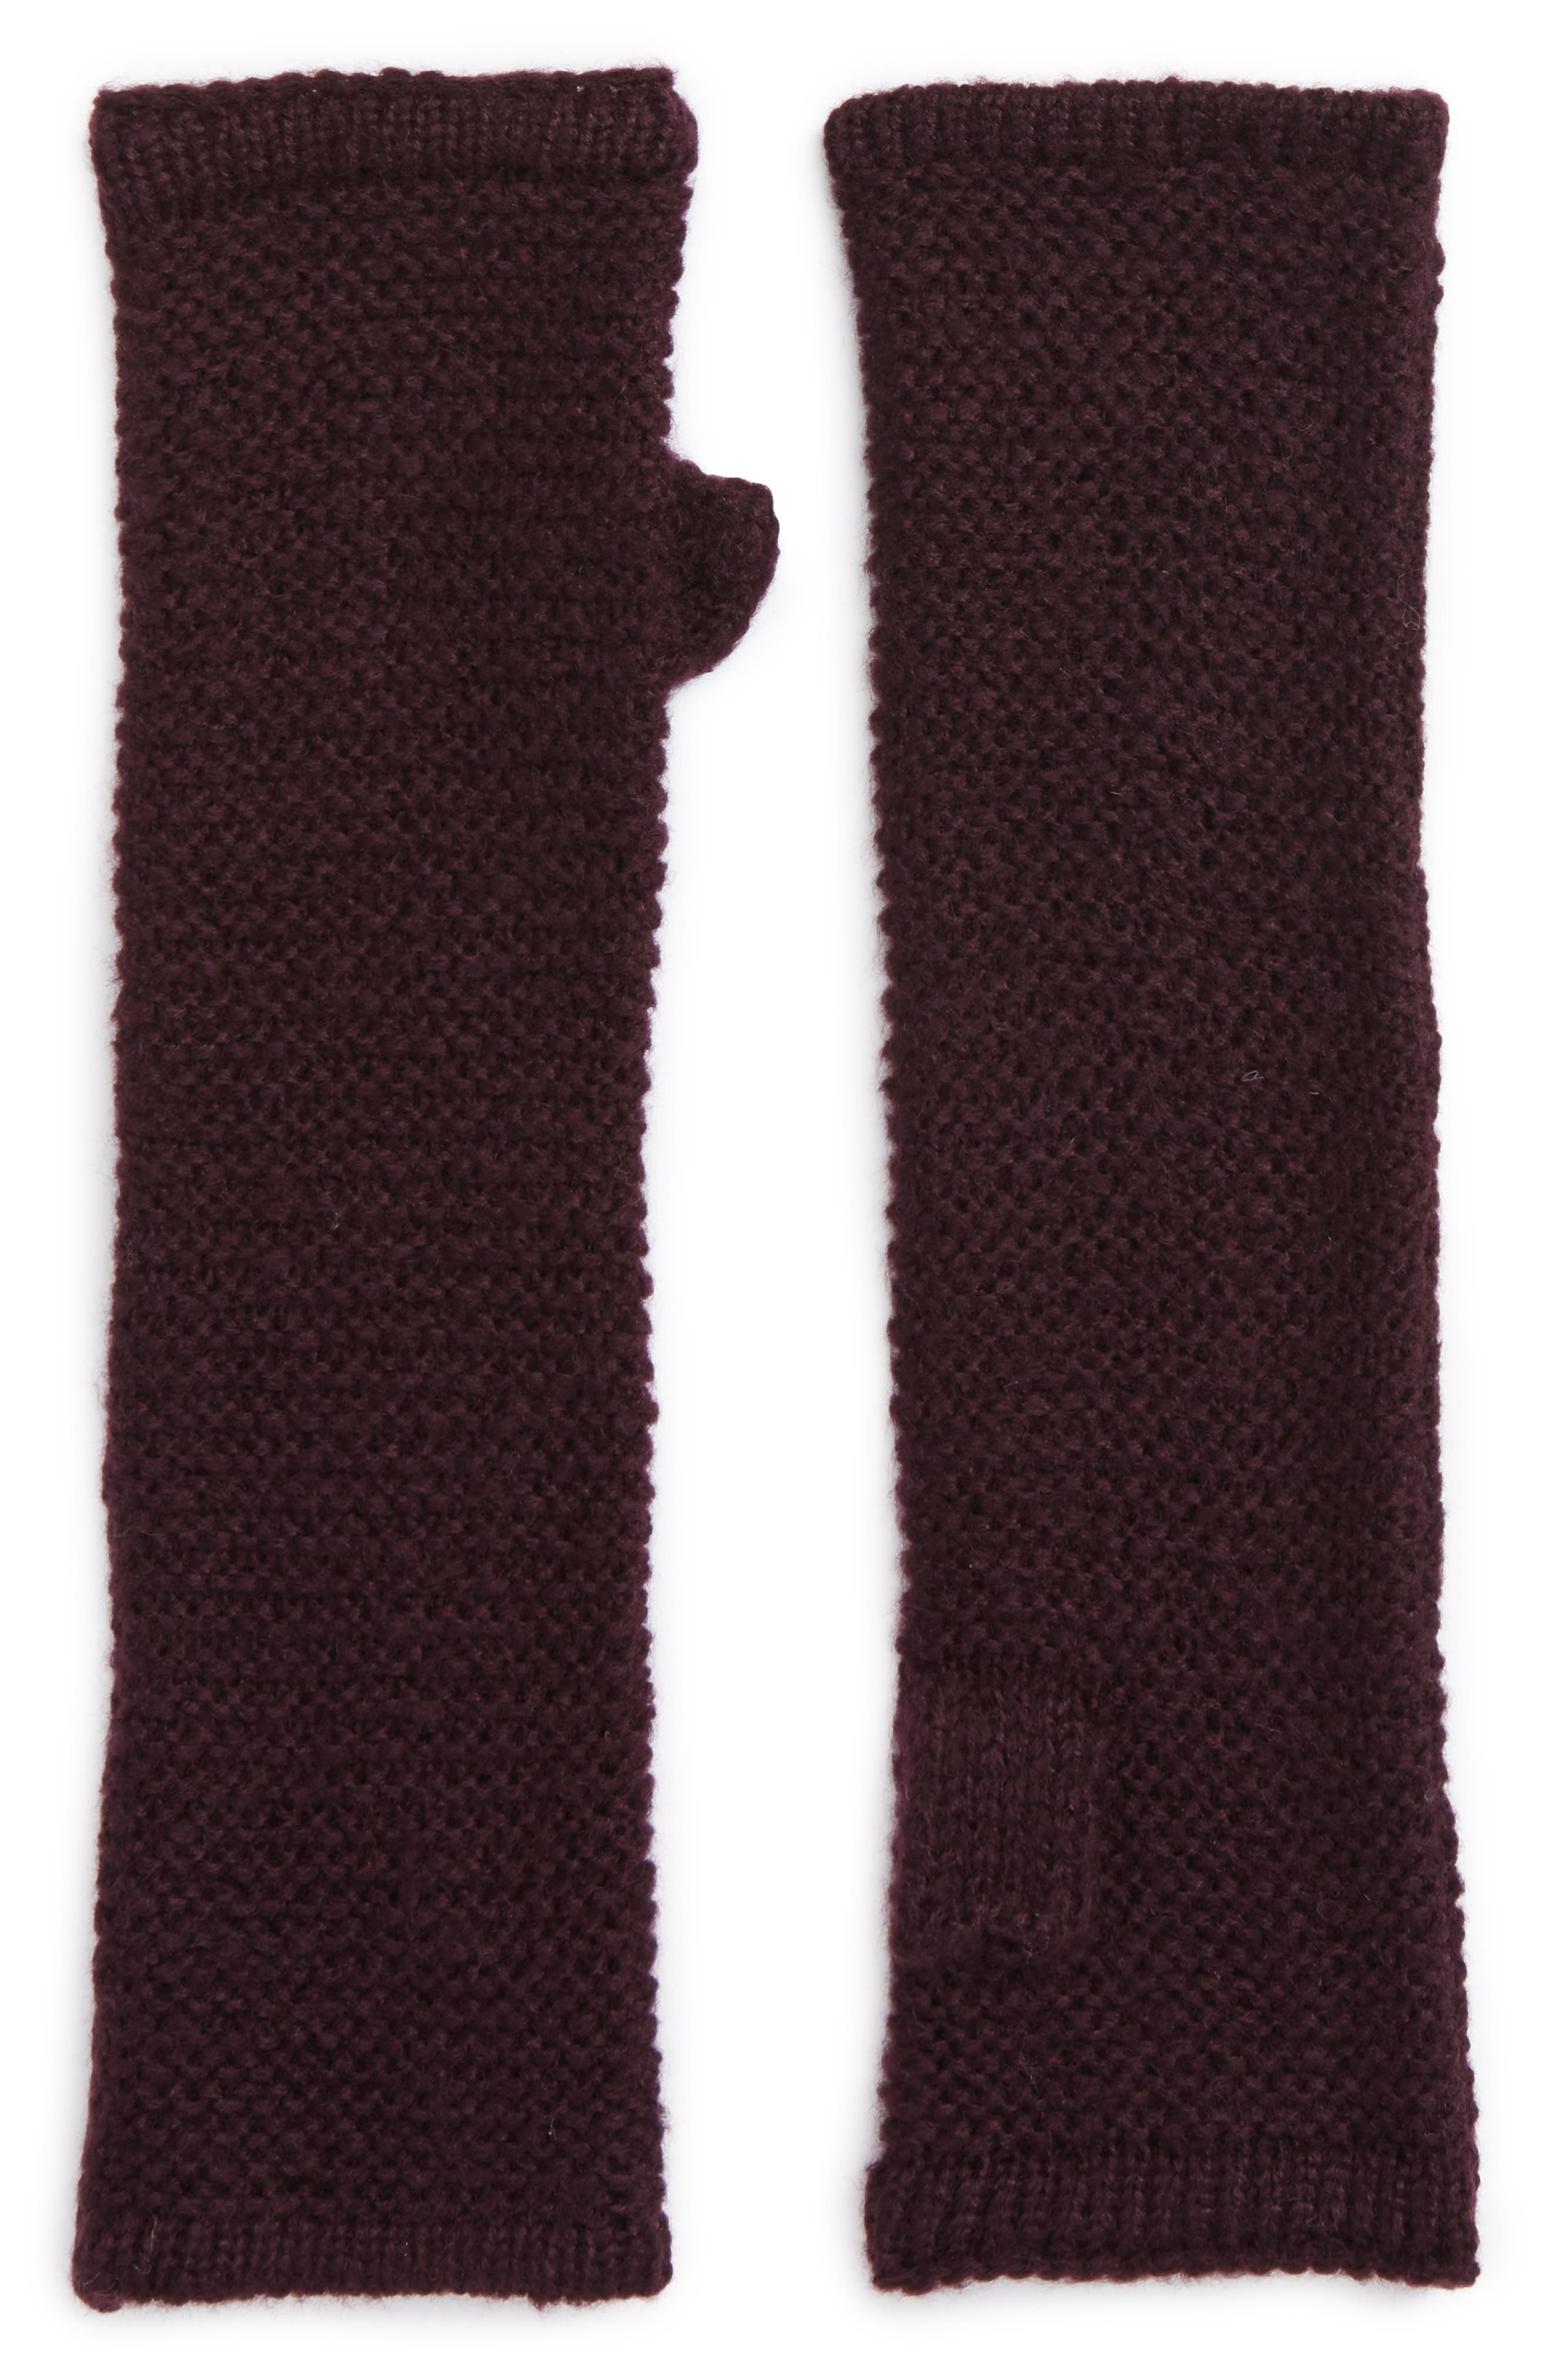 Garter Stitch Fingerless Gloves,                         Main,                         color, Deep Eggplant